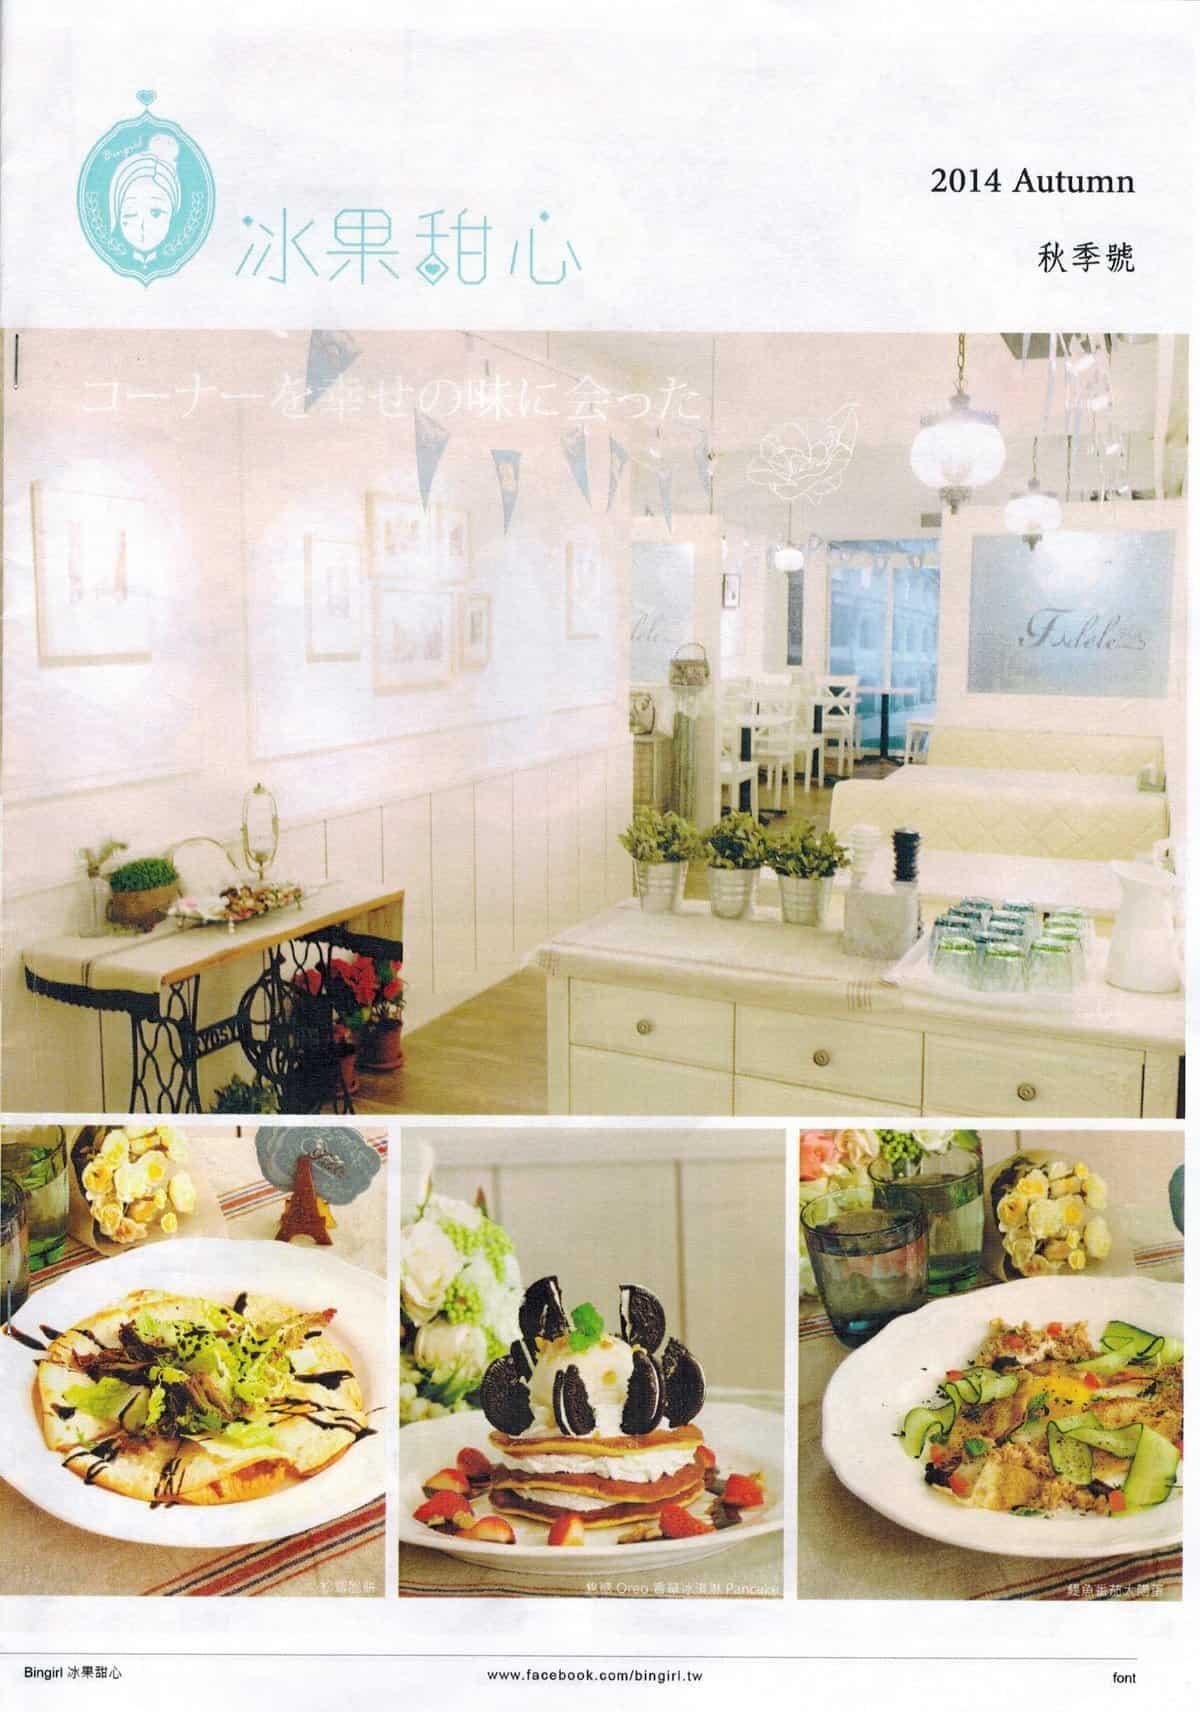 taipei-bingirl-menu1